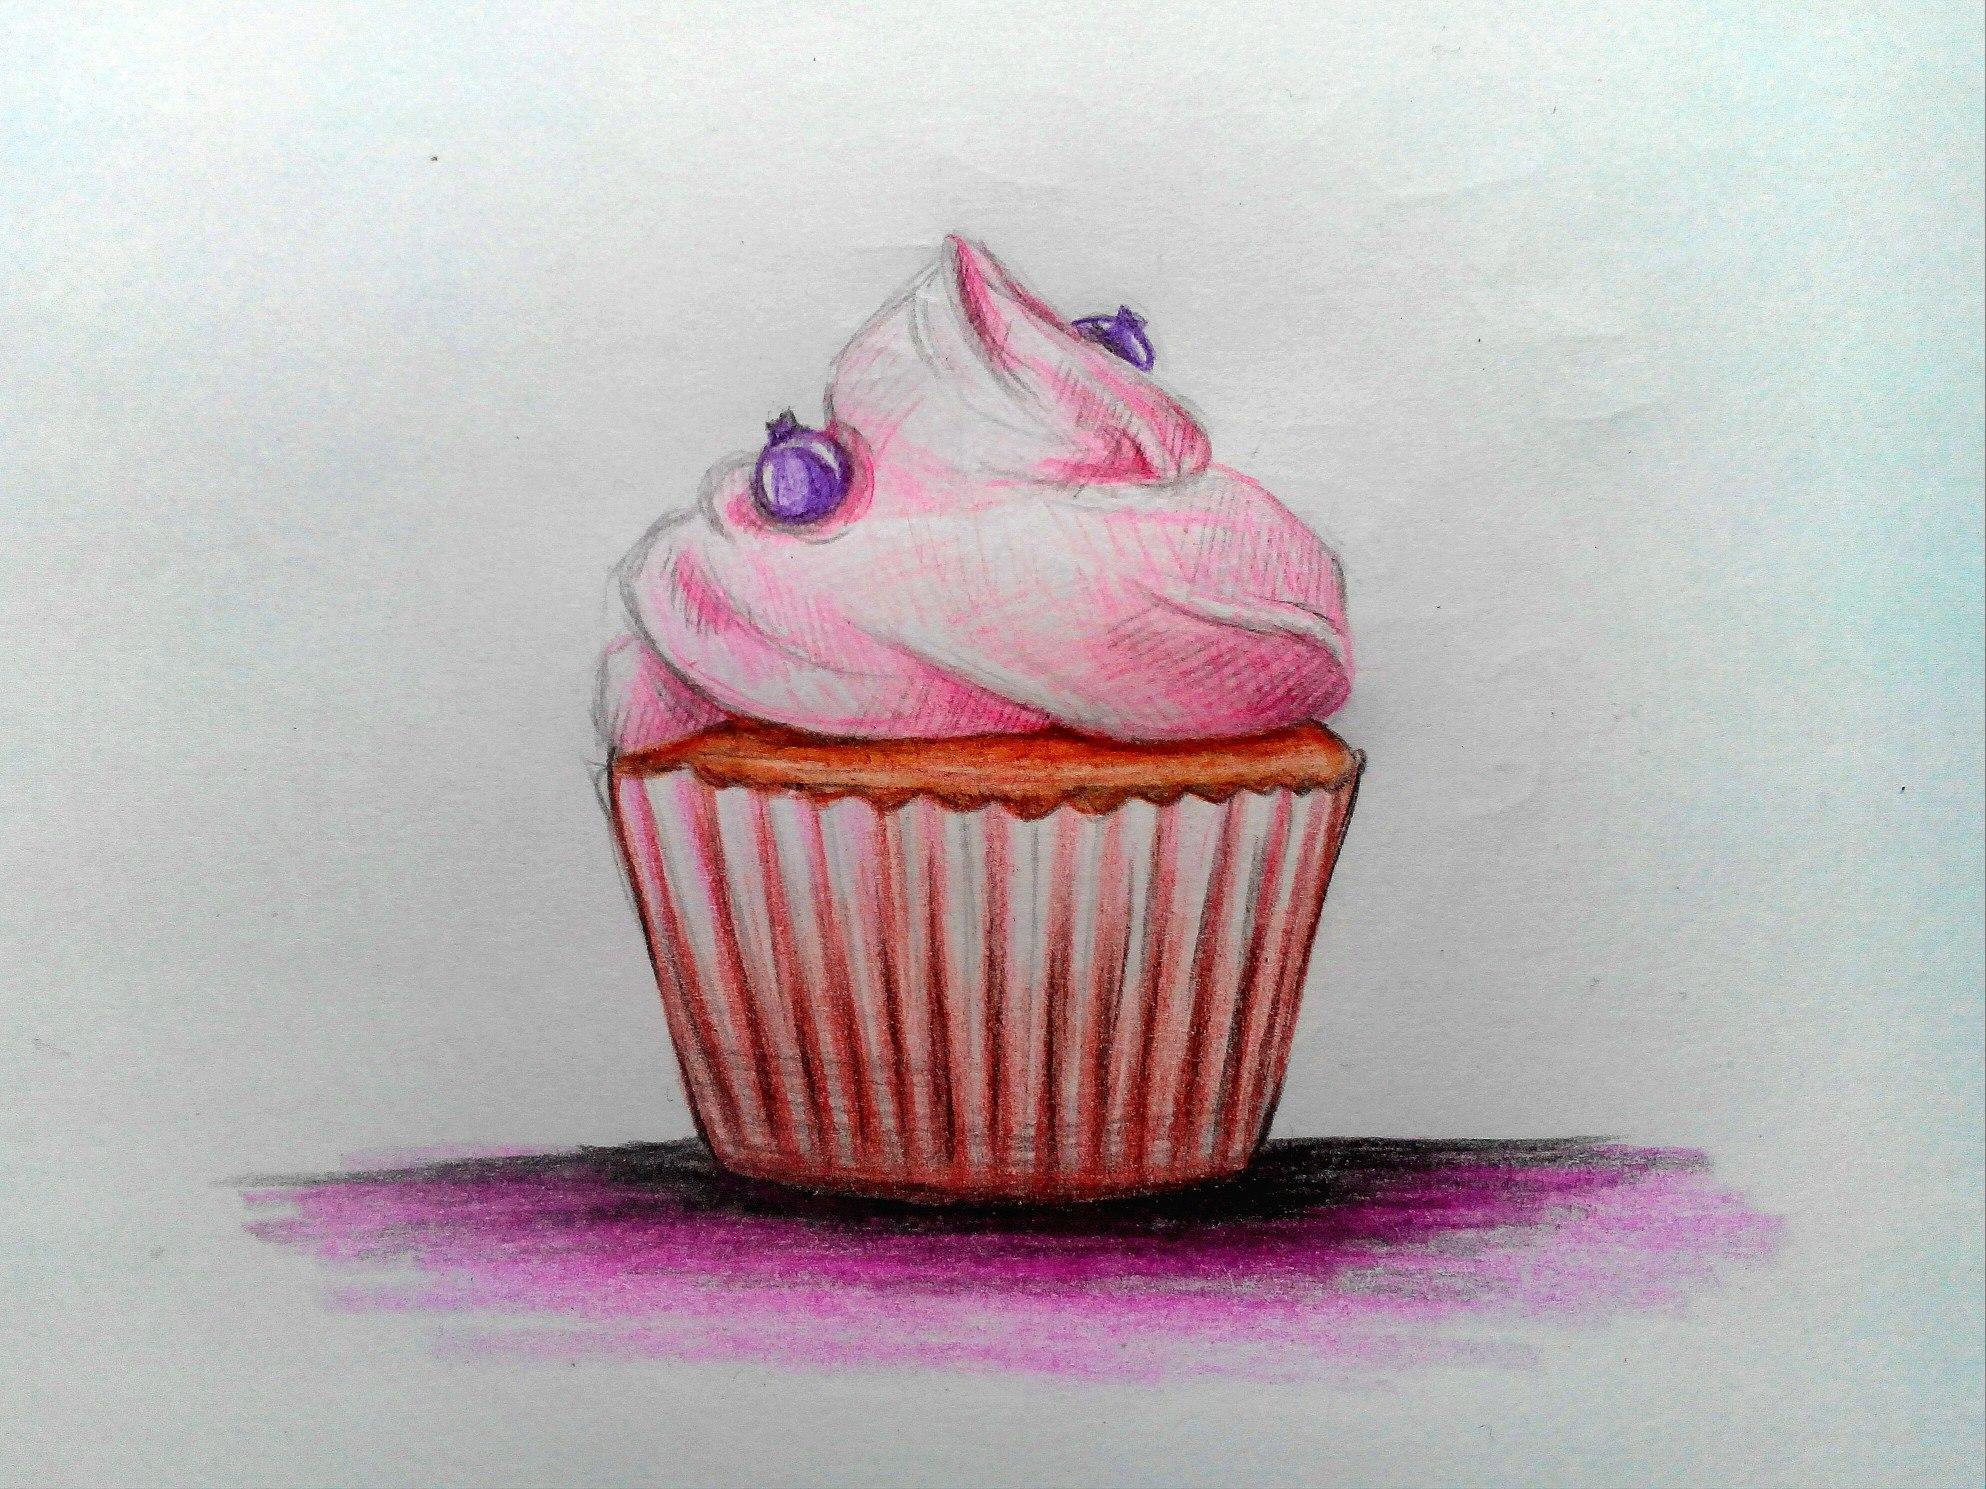 нарисованный кекс